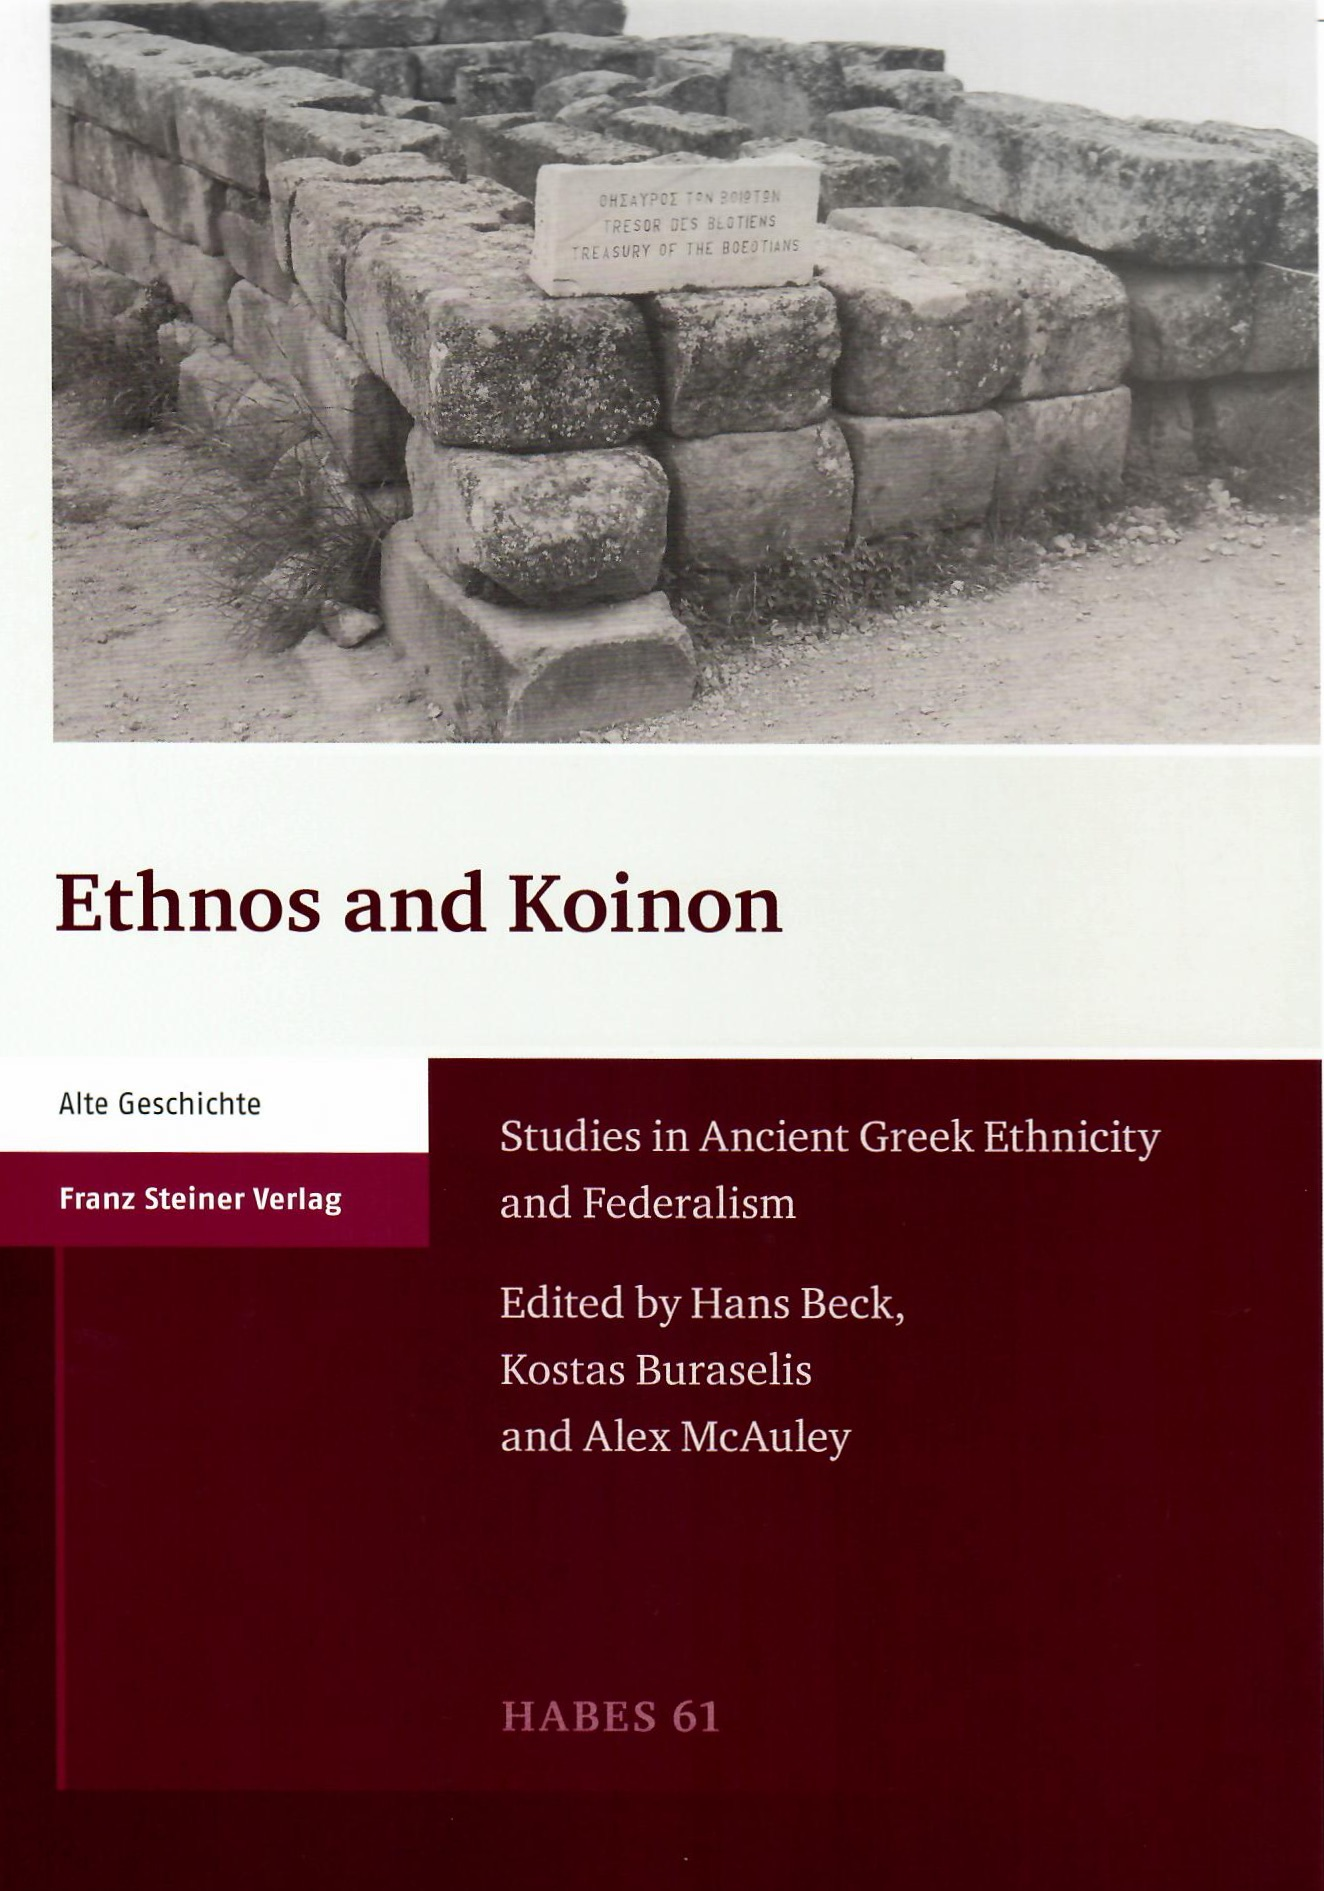 Ethnos and Koinon.jpg